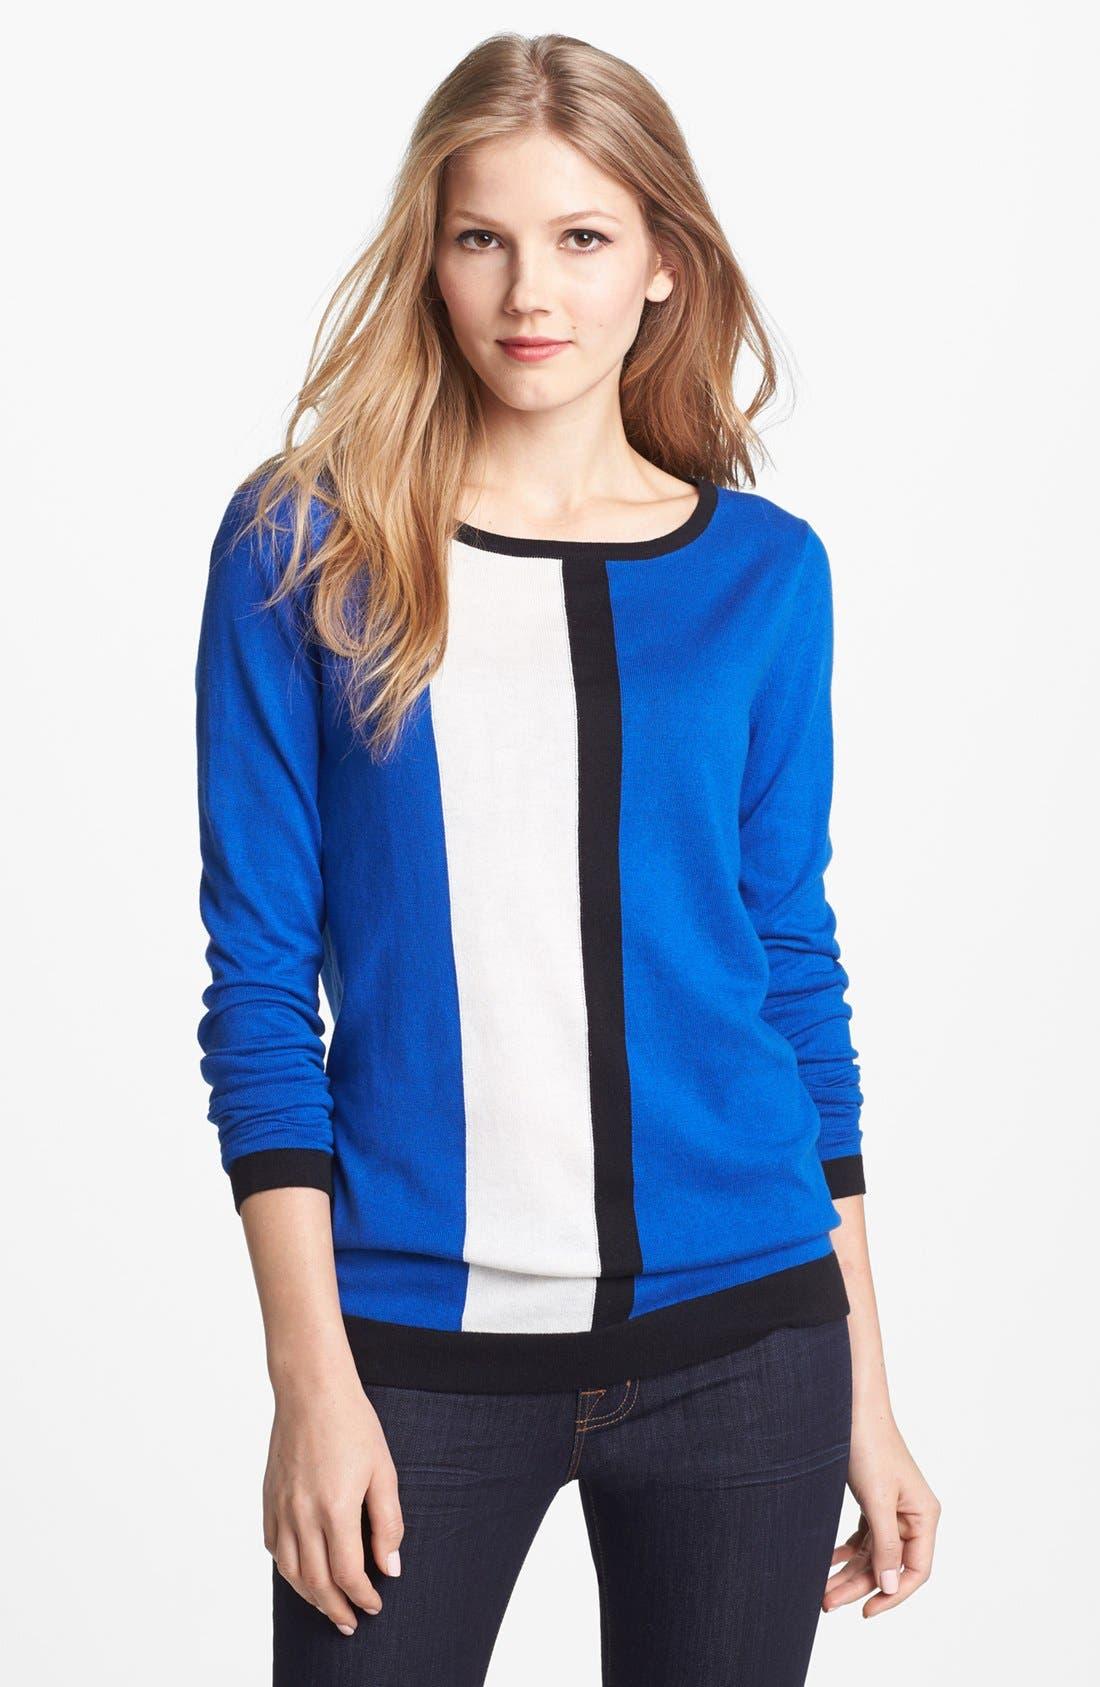 Alternate Image 1 Selected - Vince Camuto Vertical Stripe Colorblock Cotton Blend Sweater